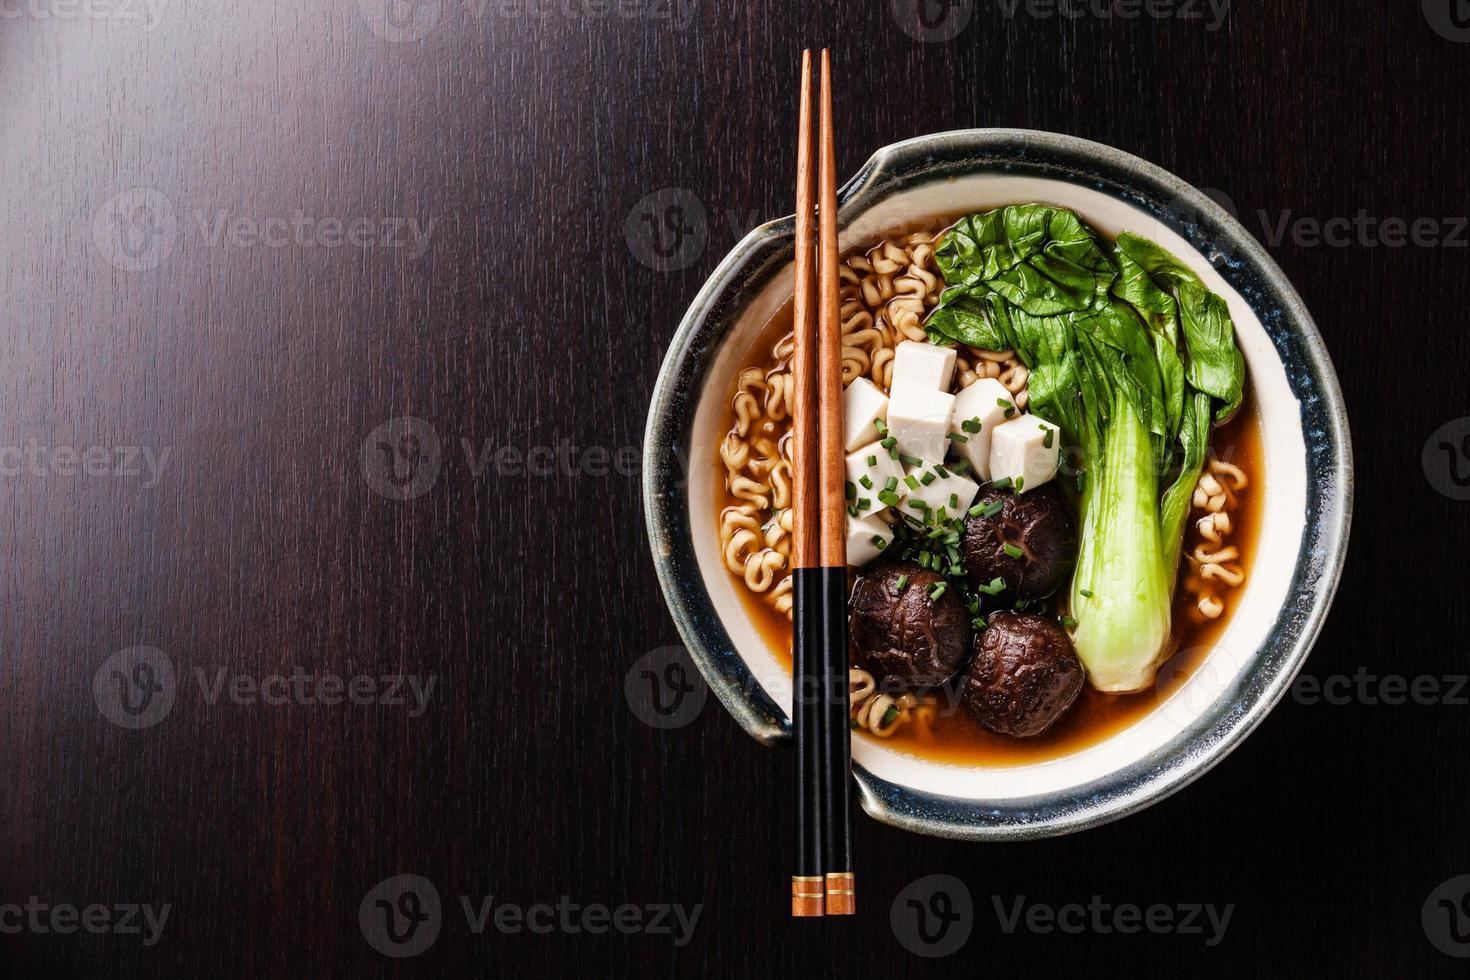 Miso Ramen Asian noodles with shiitake, tofu and pak choi photo